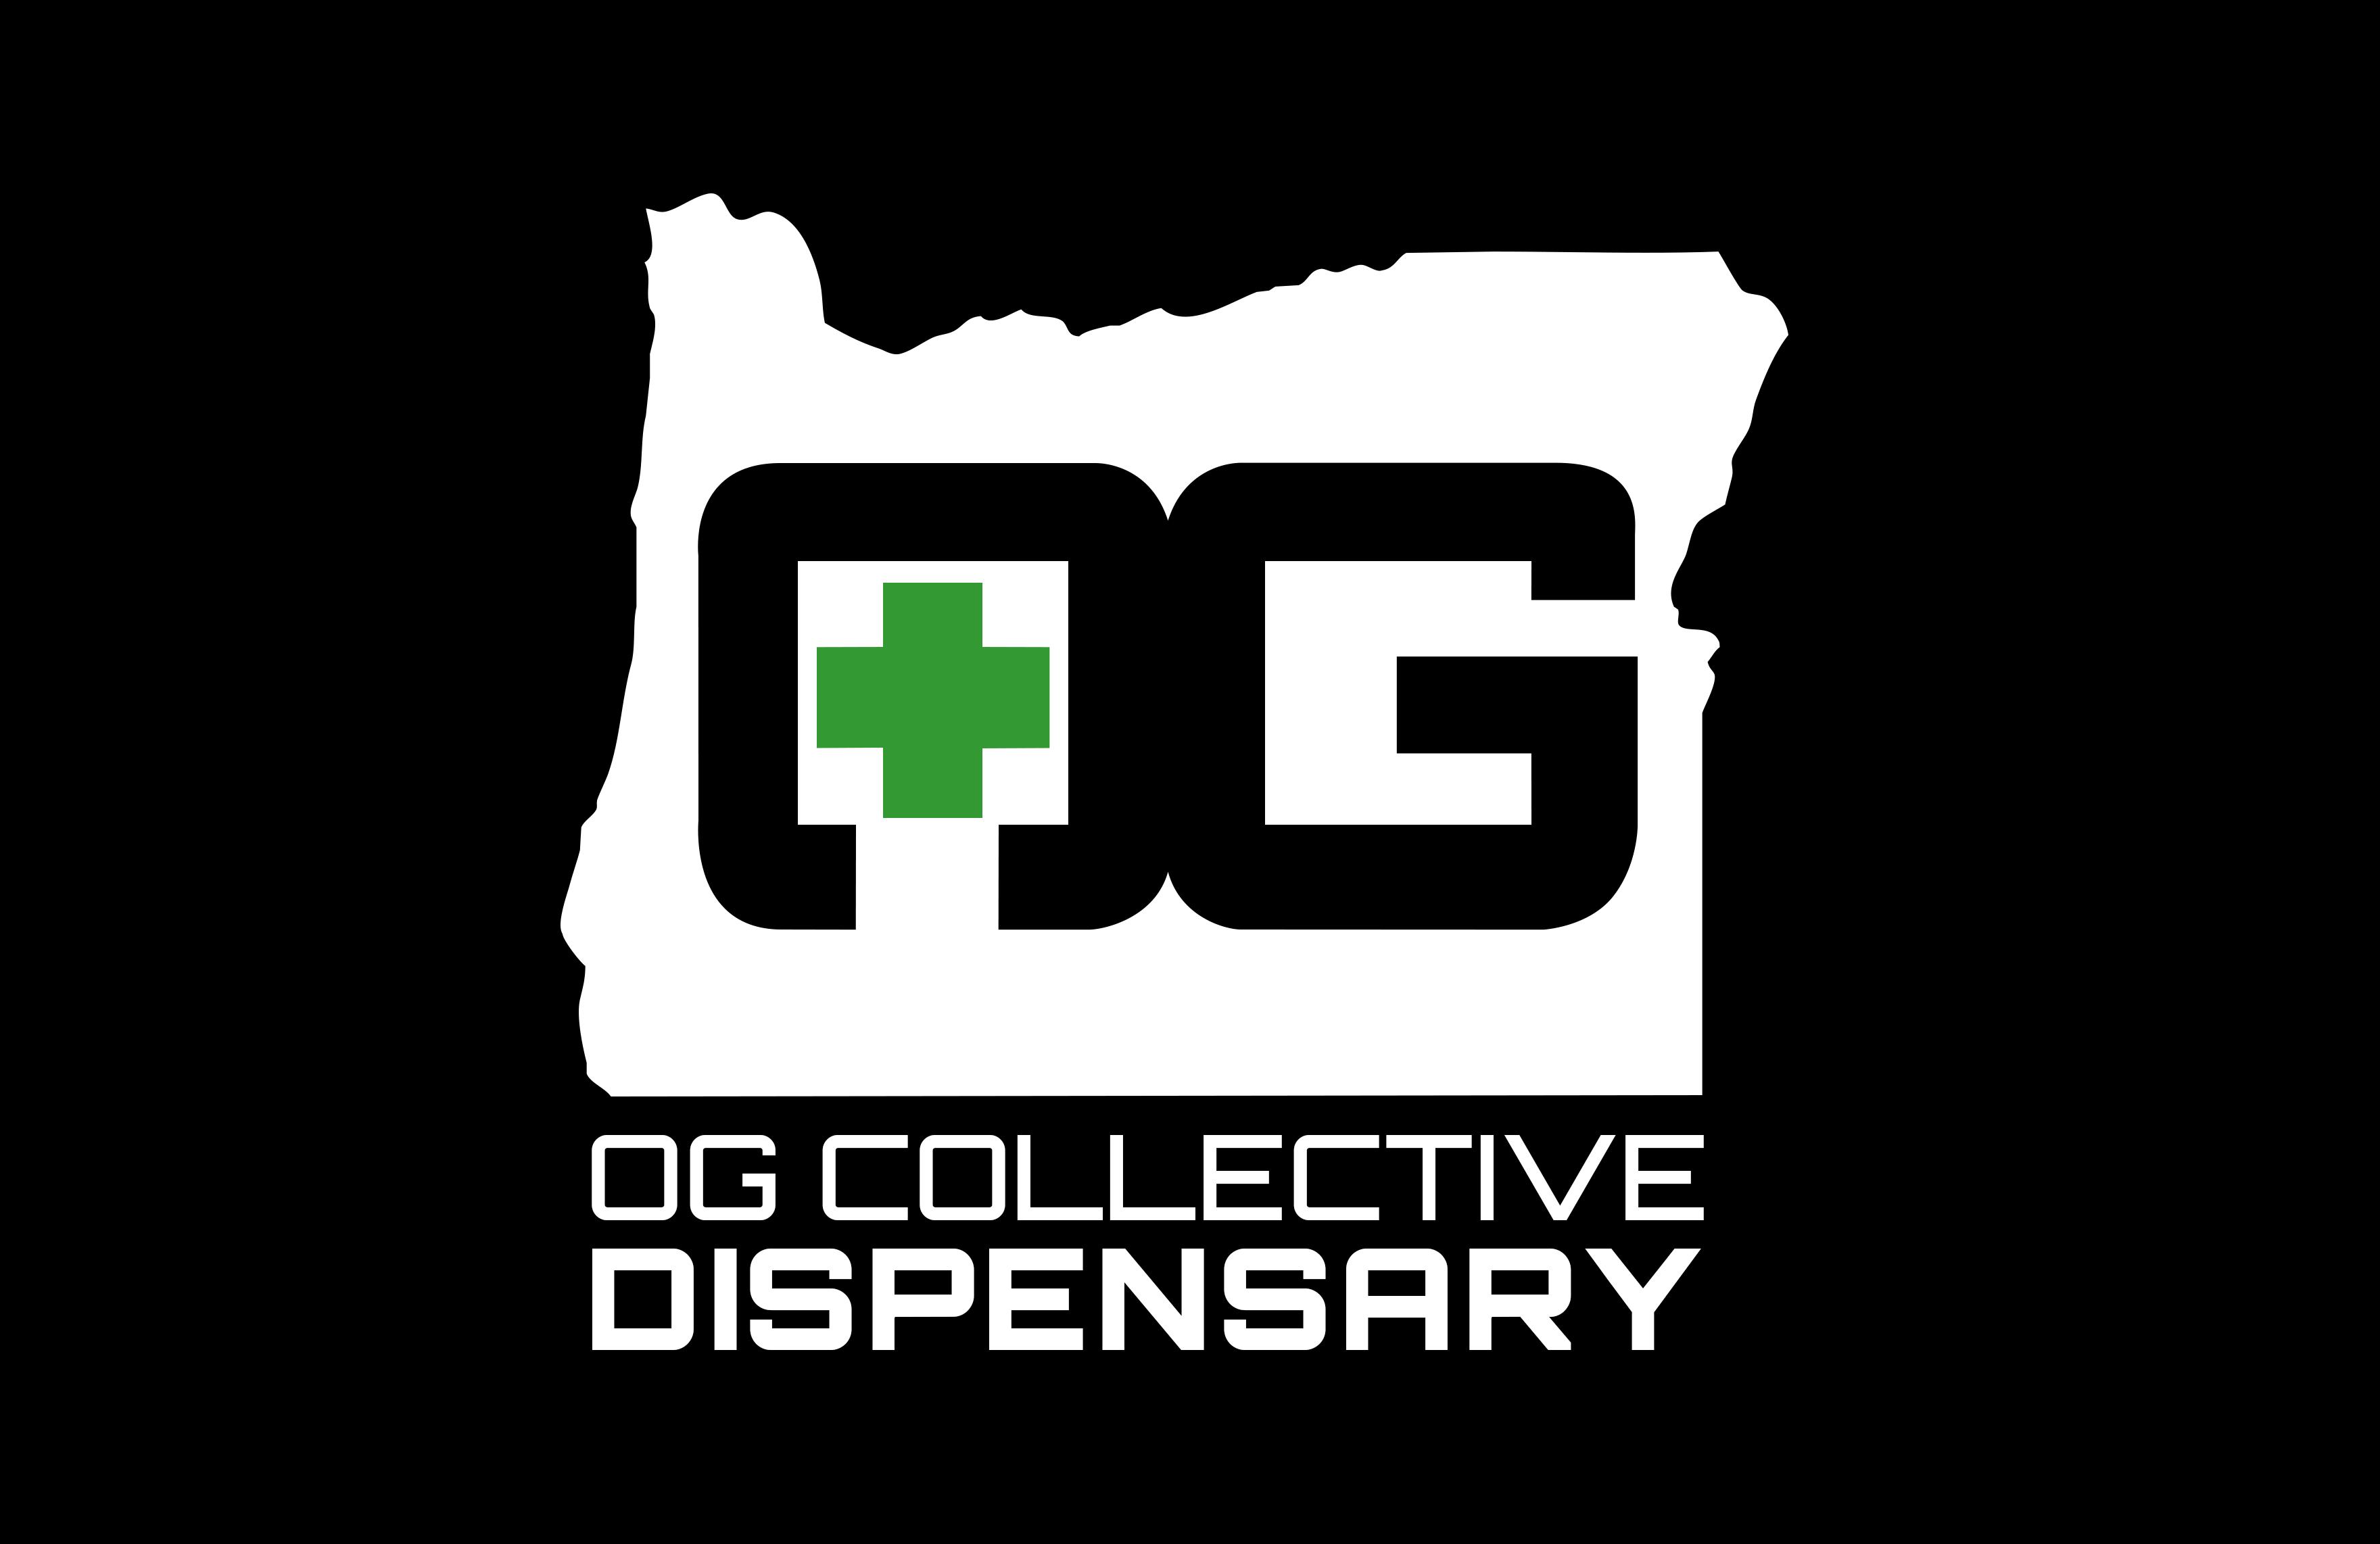 OG Collective